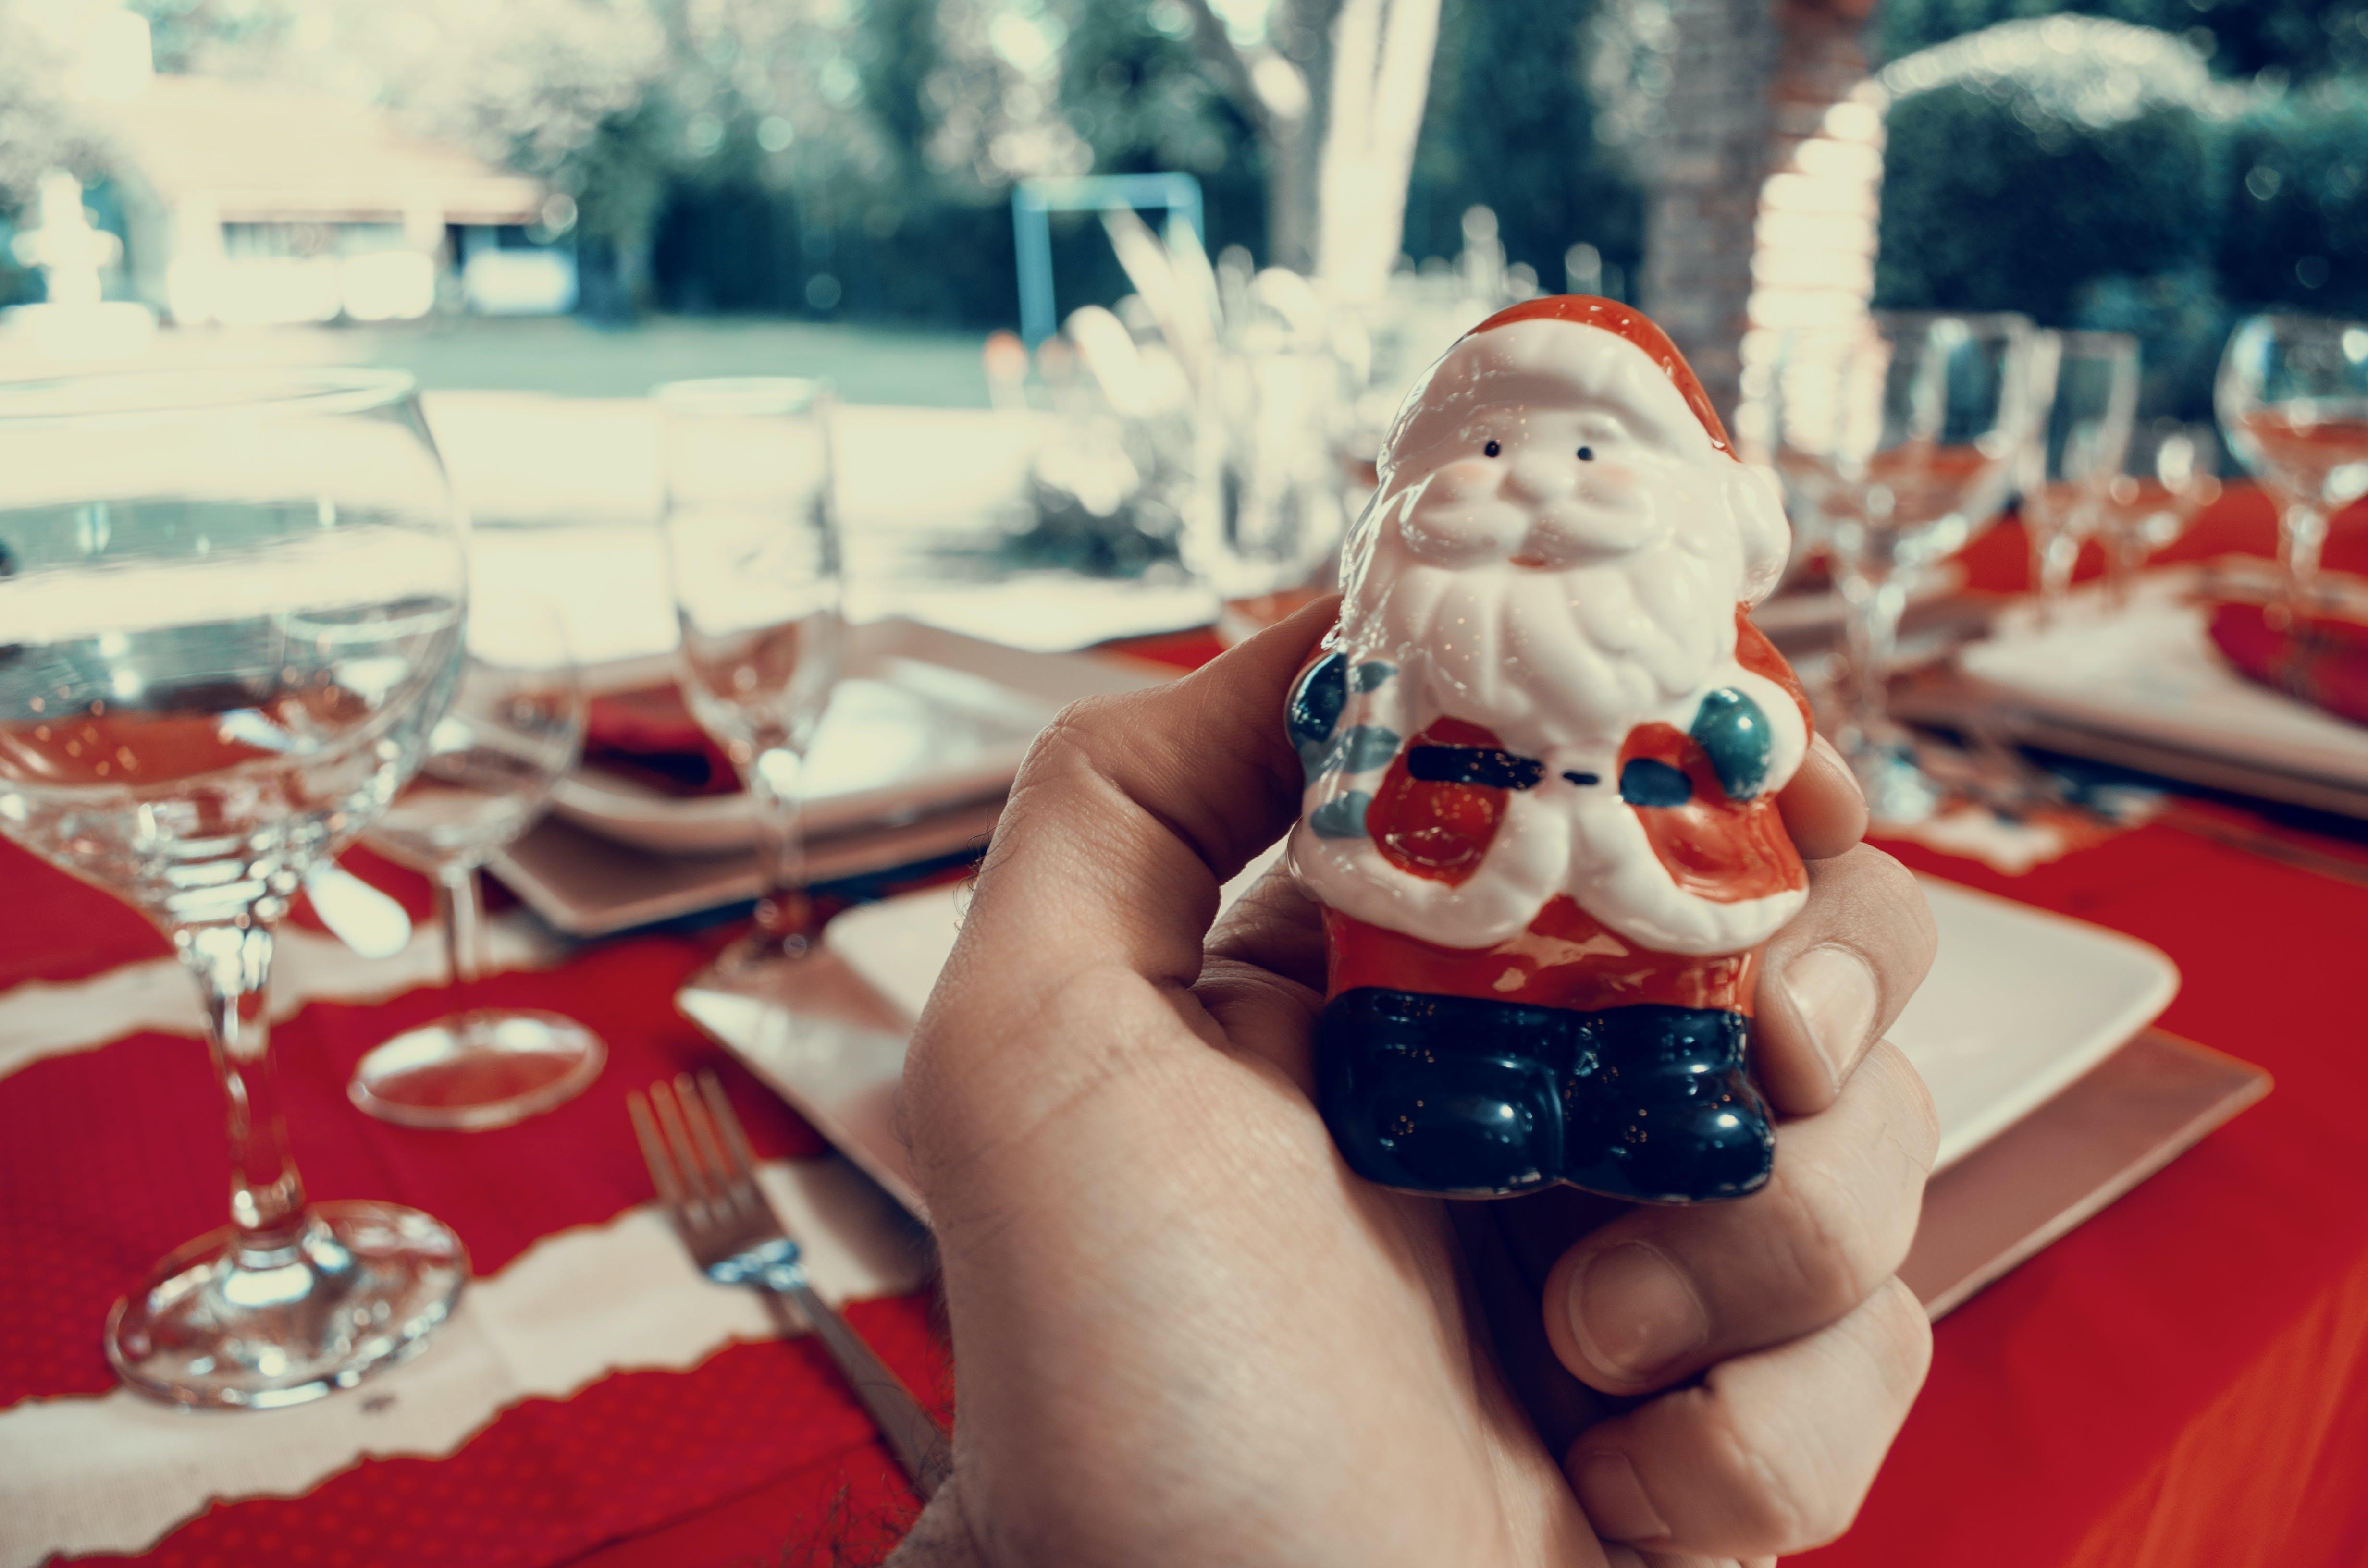 Person Holding Santa Claus Figurine